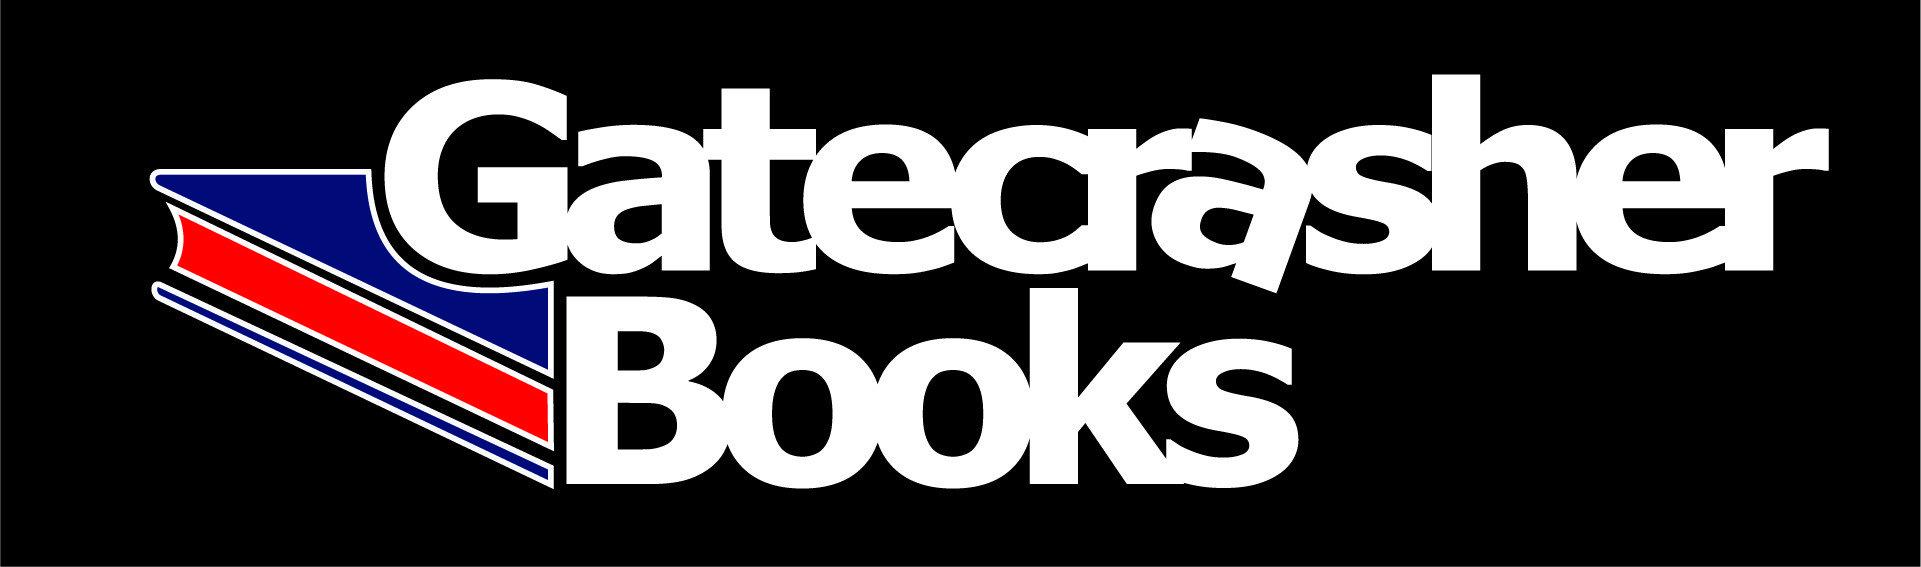 Gatecrasher Books logo